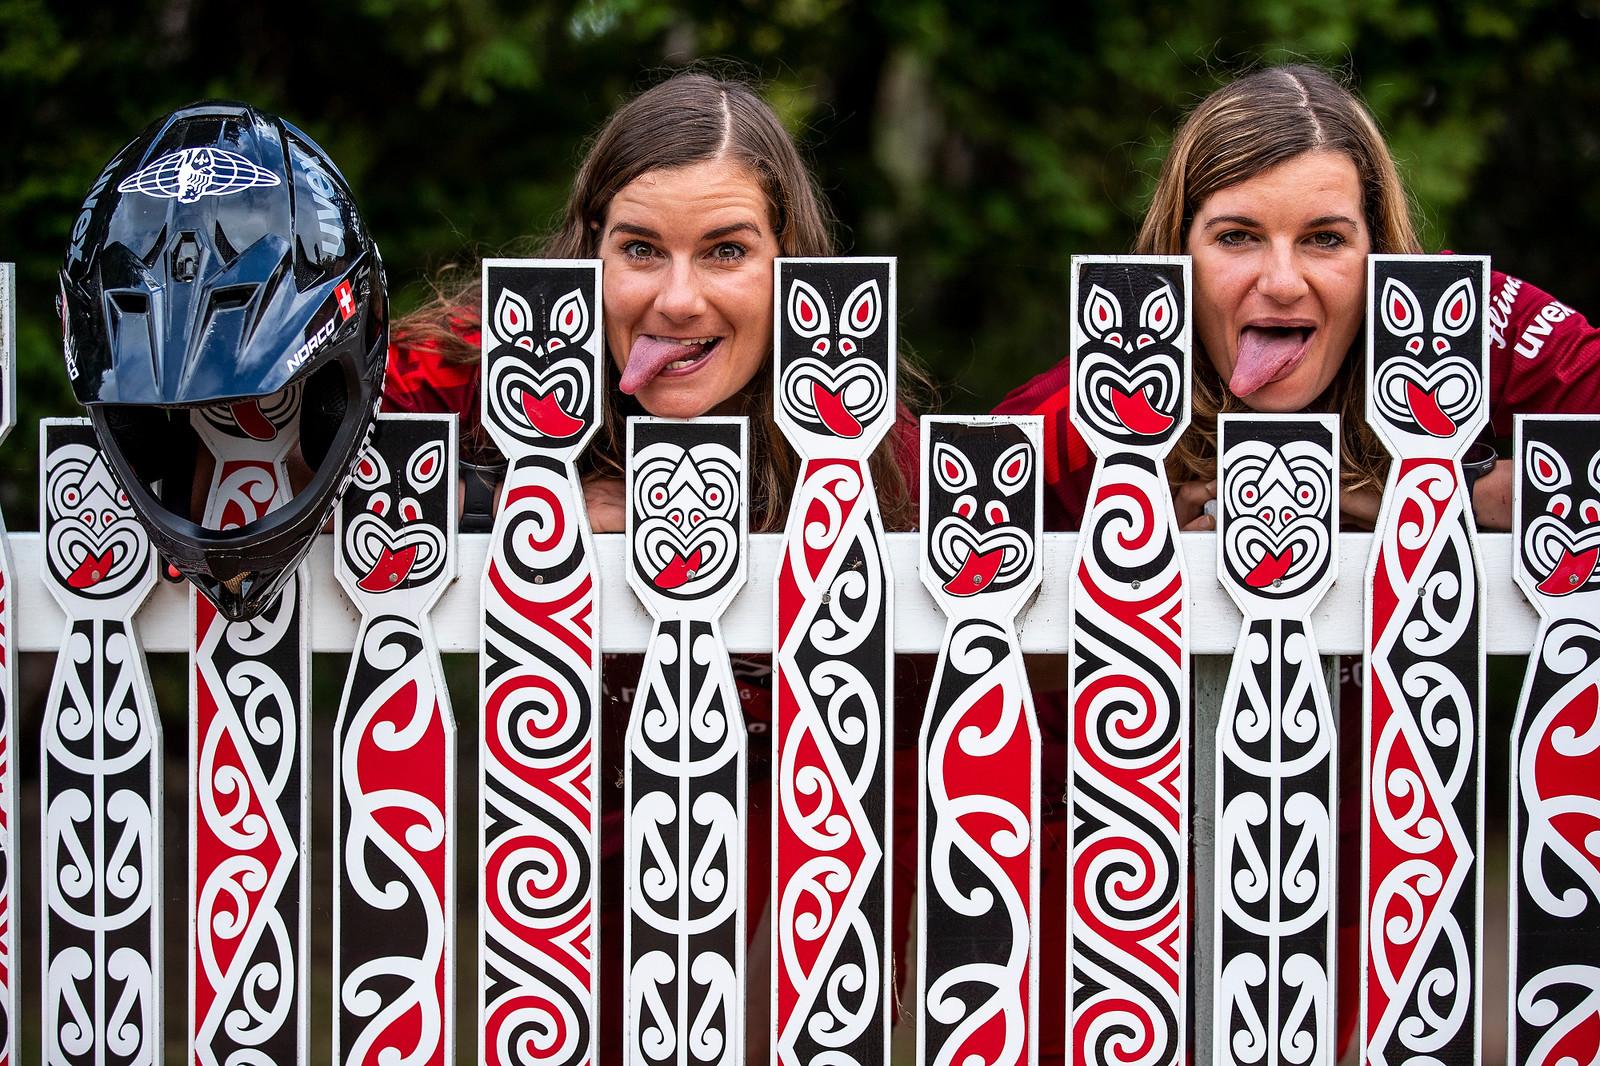 Gehrig Twins - 2019 Enduro World Series Crankworx Rotorua - Mountain Biking Pictures - Vital MTB